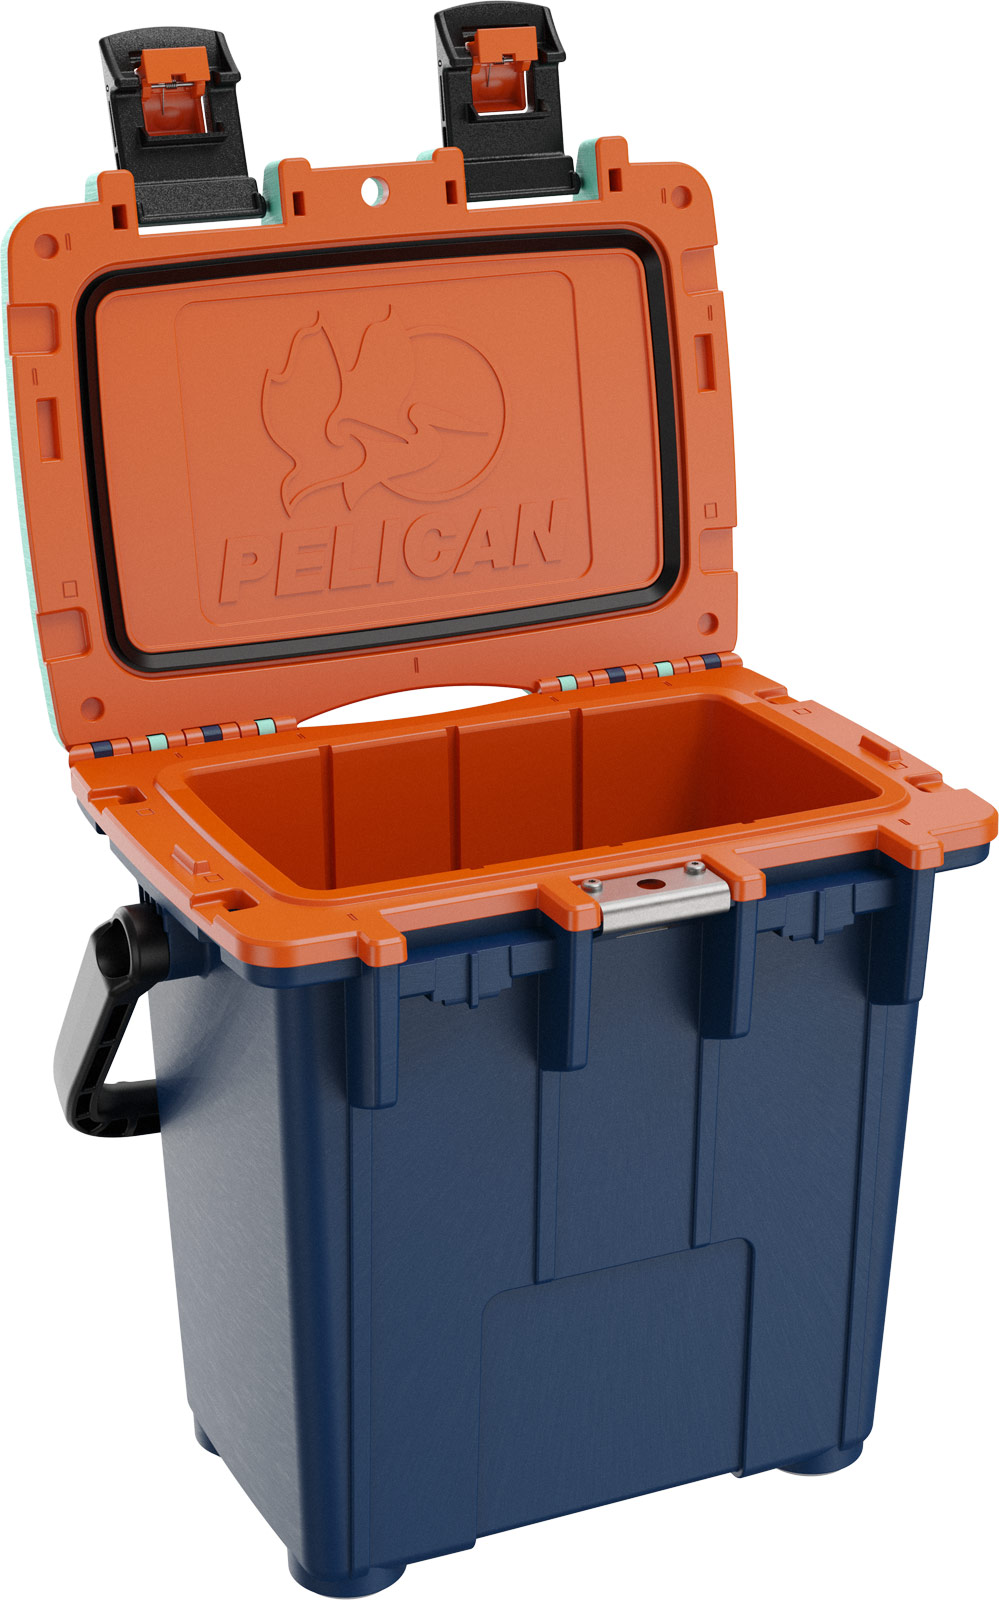 pelican picnic cooler 20qt pacific blue orange seafoam